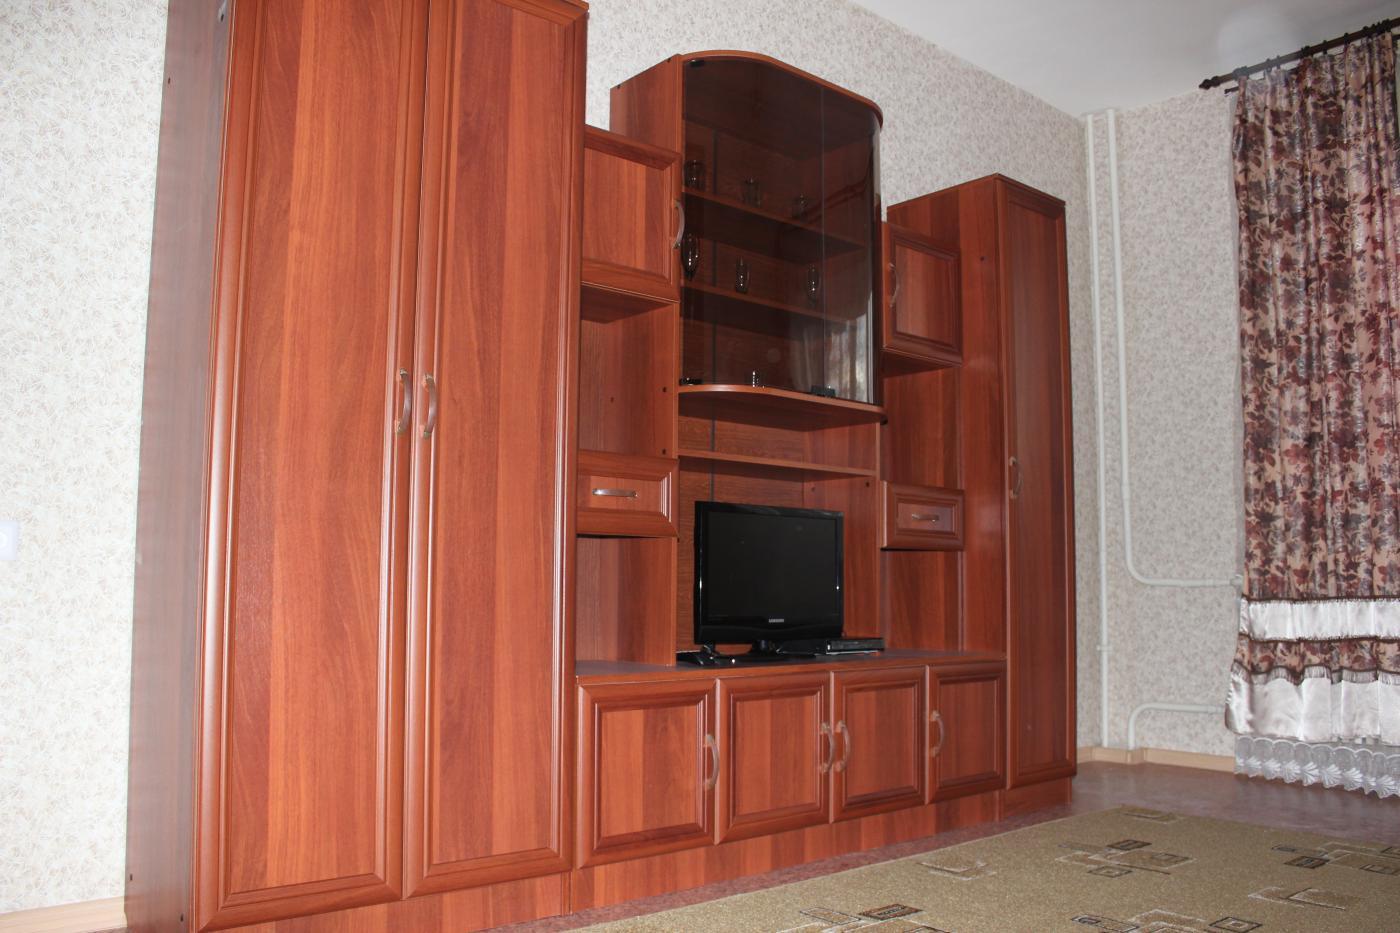 1-комнатная квартира посуточно (вариант № 4353), ул. Хользунова улица, фото № 4